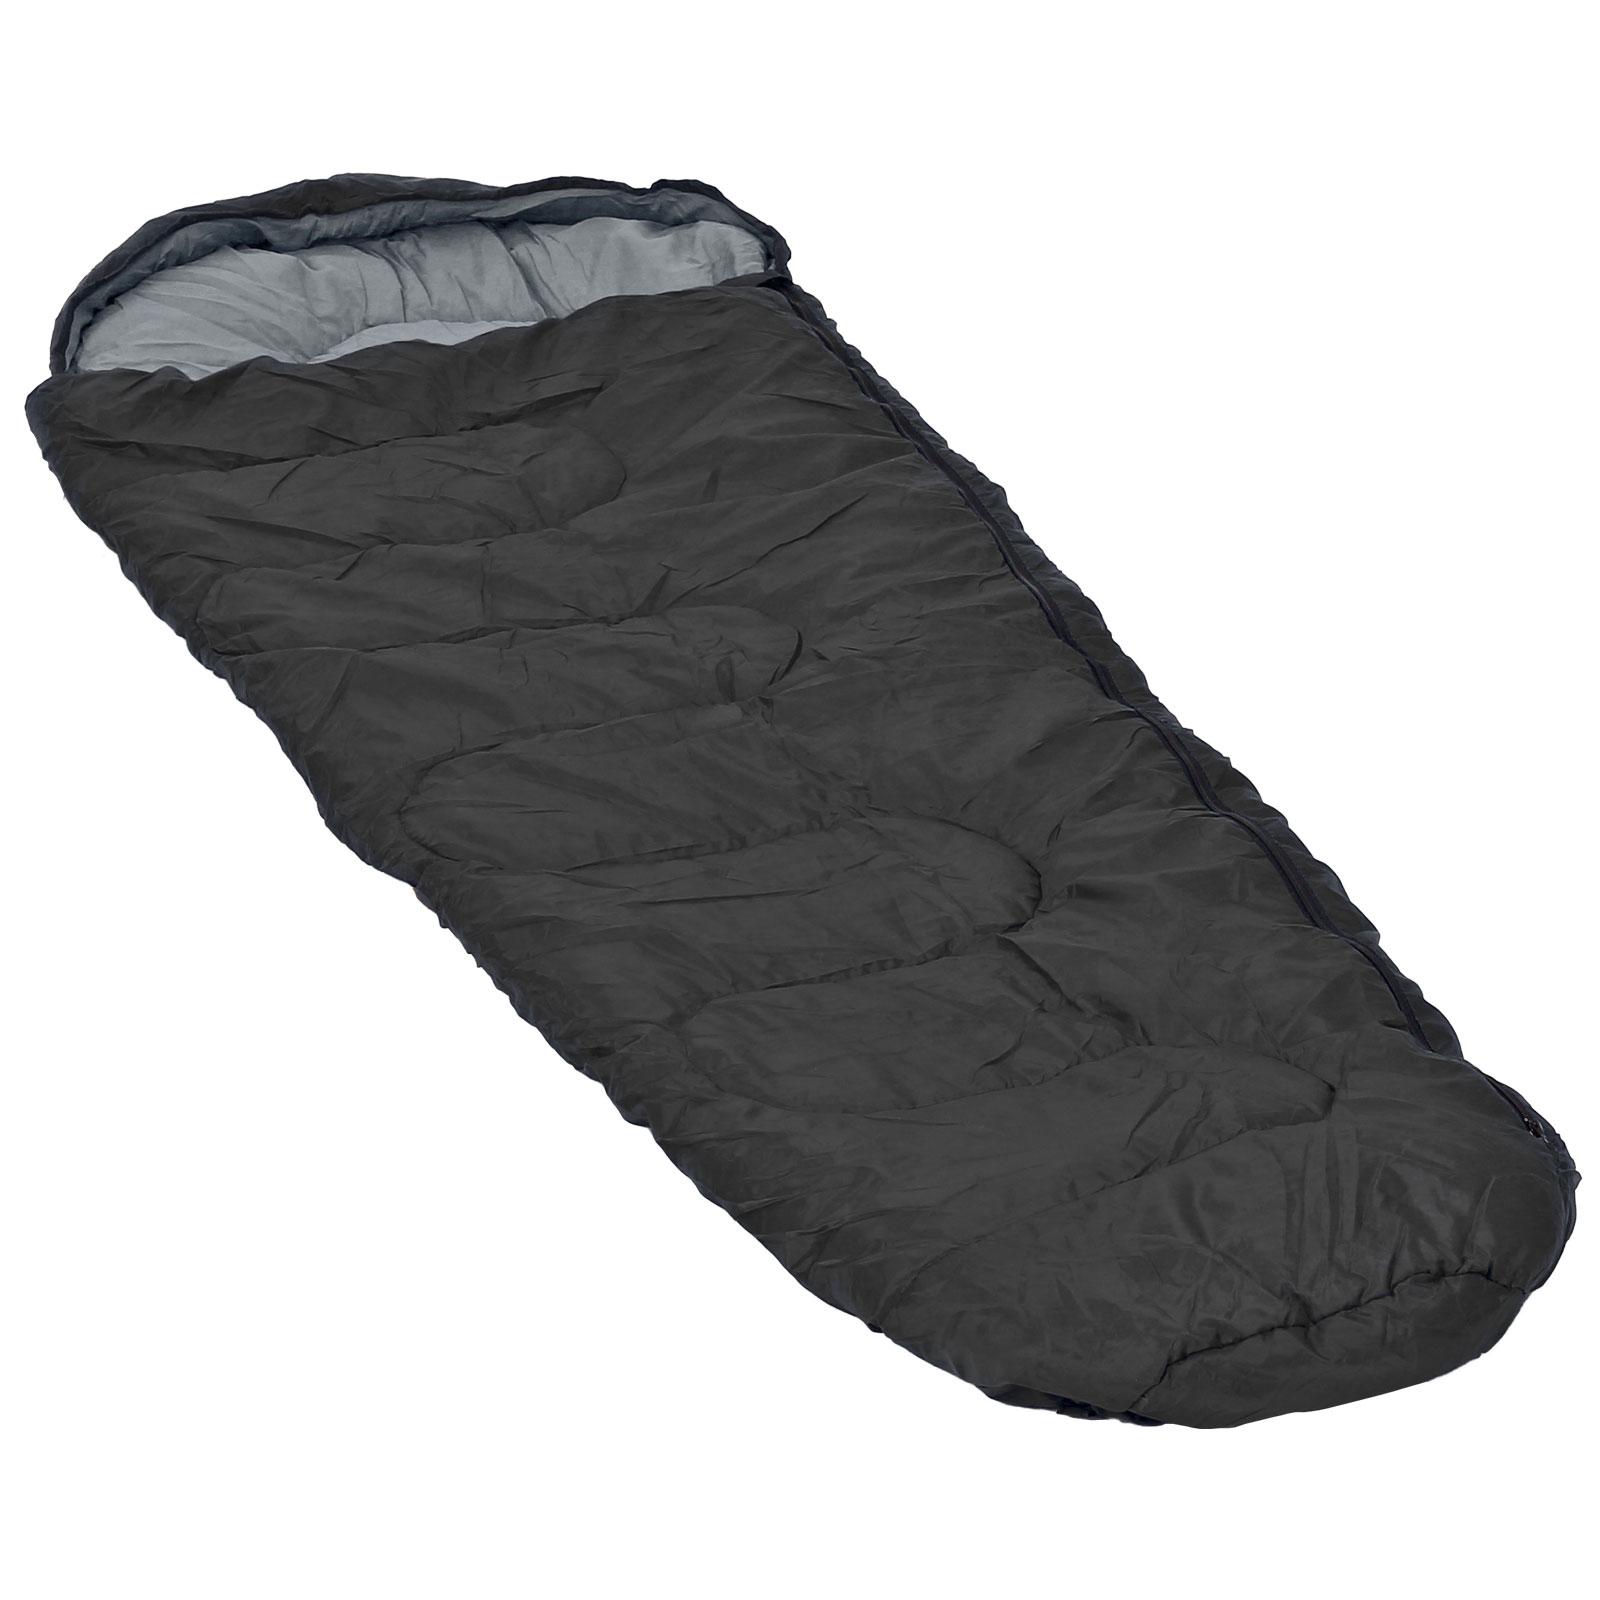 mumienschlafsack schlafsack zelt camping outdoor 11 c. Black Bedroom Furniture Sets. Home Design Ideas